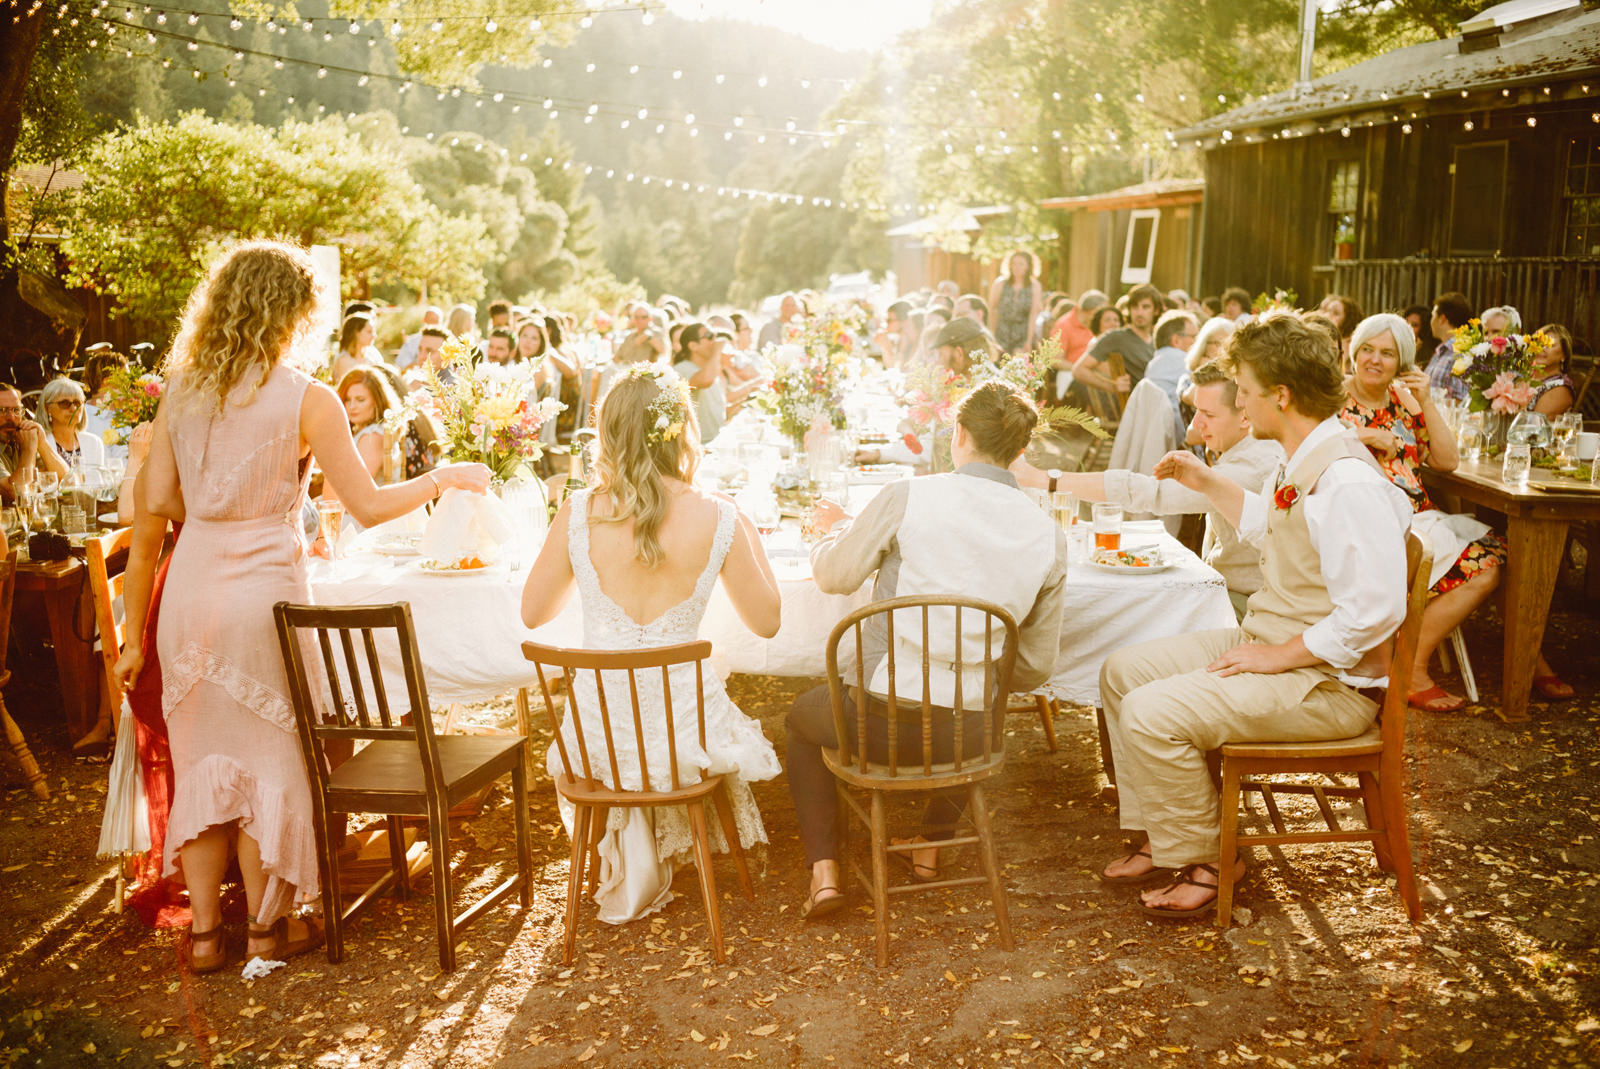 rivers-bend-retreat-wedding-073 RIVER'S BEND RETREAT WEDDING